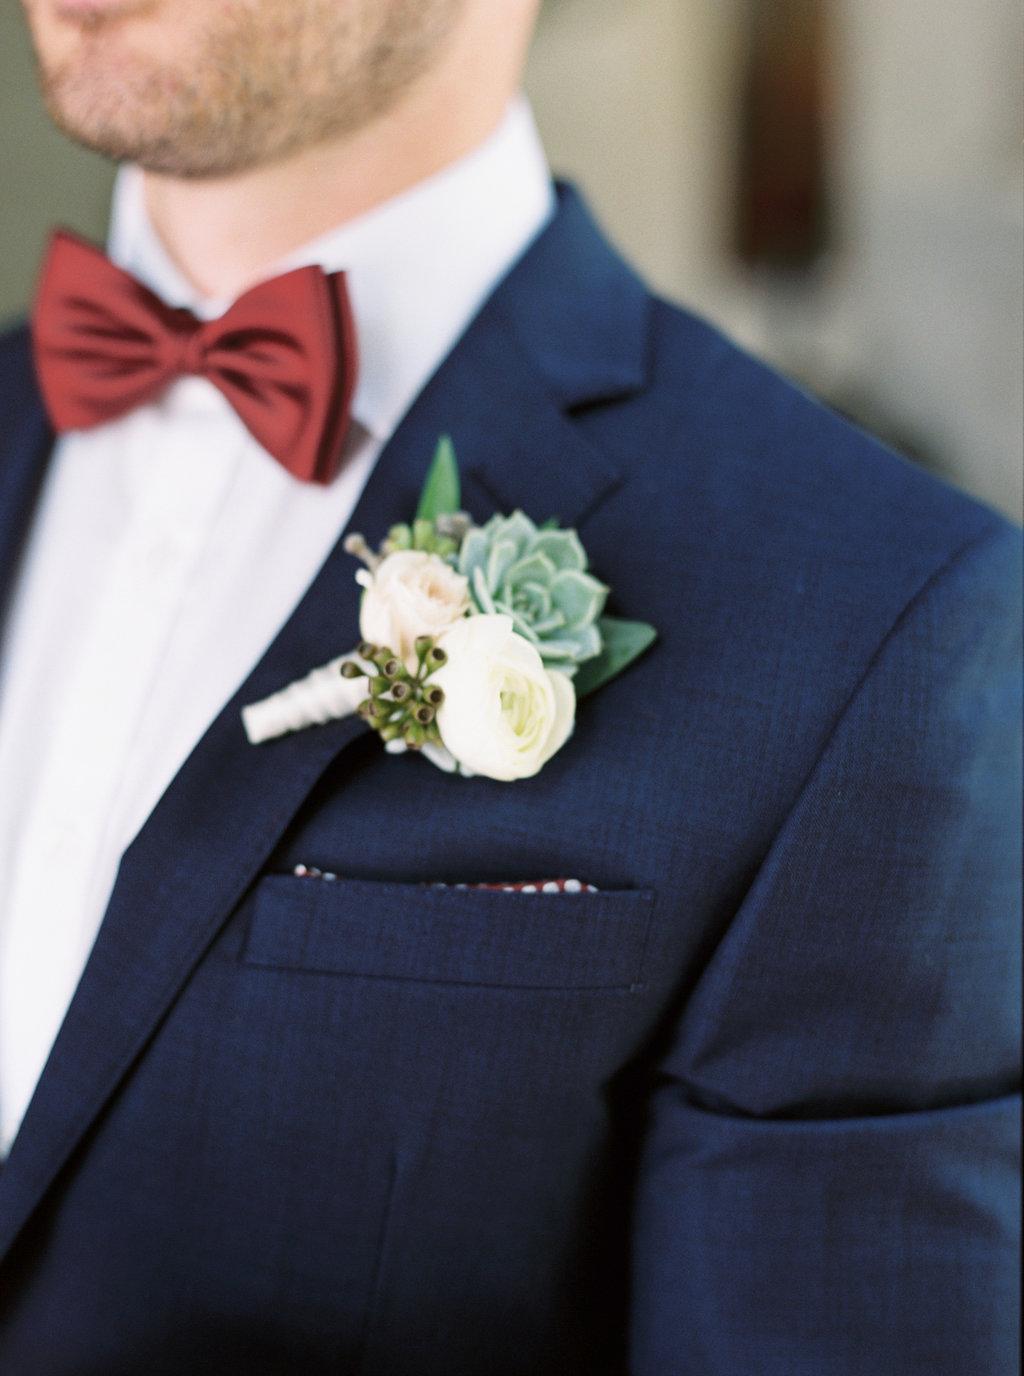 nicoleclarey_stacey+alexwedding_bride+groom-10.jpg